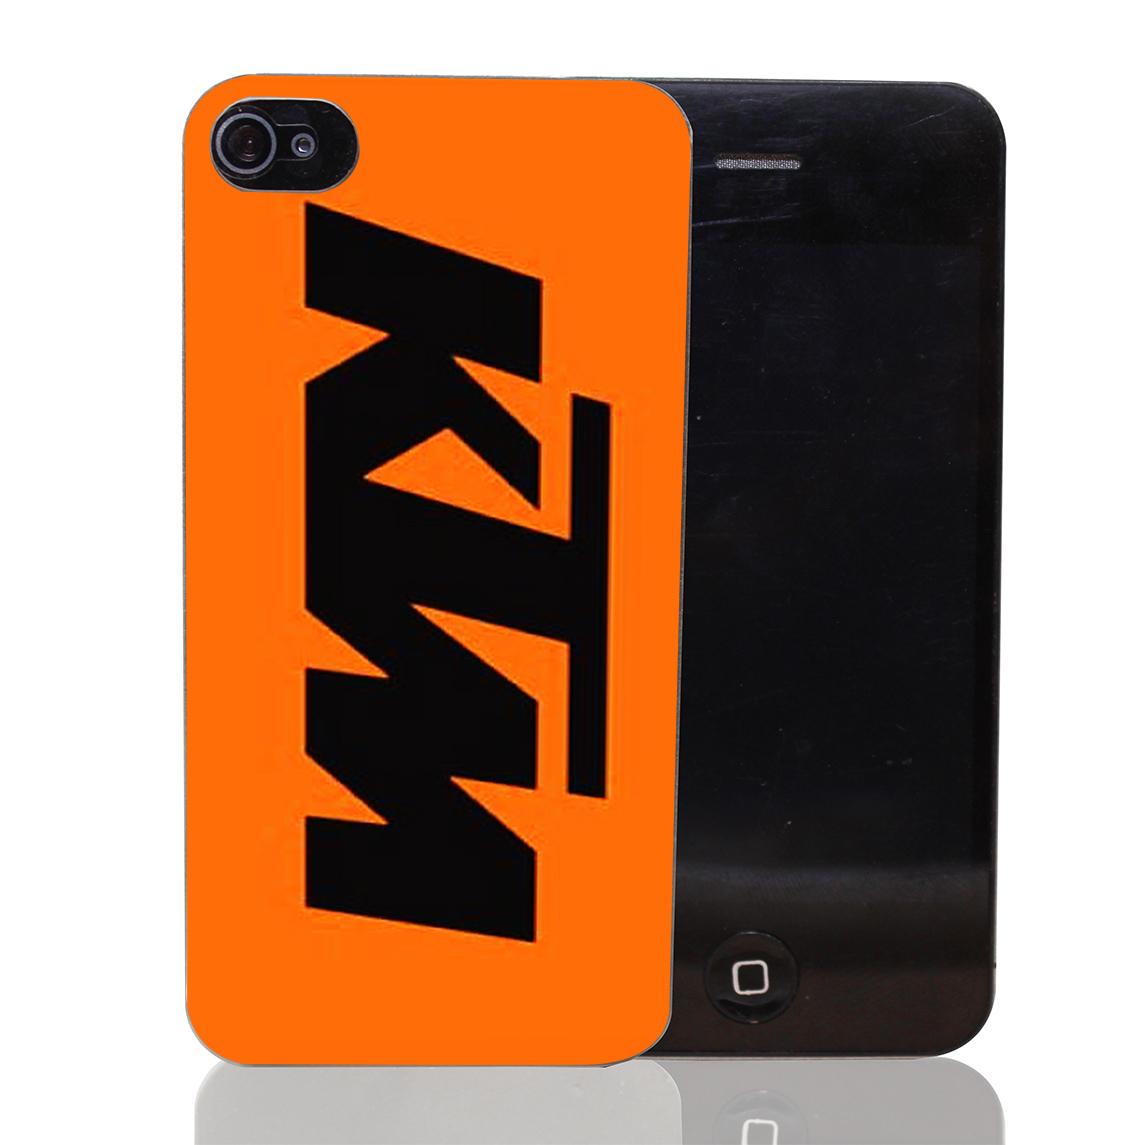 663T Best KTM Orange Hard Transparent Clear Case for iPhone 4 4s 5 5s SE 5c 6 6s & Plus(China (Mainland))